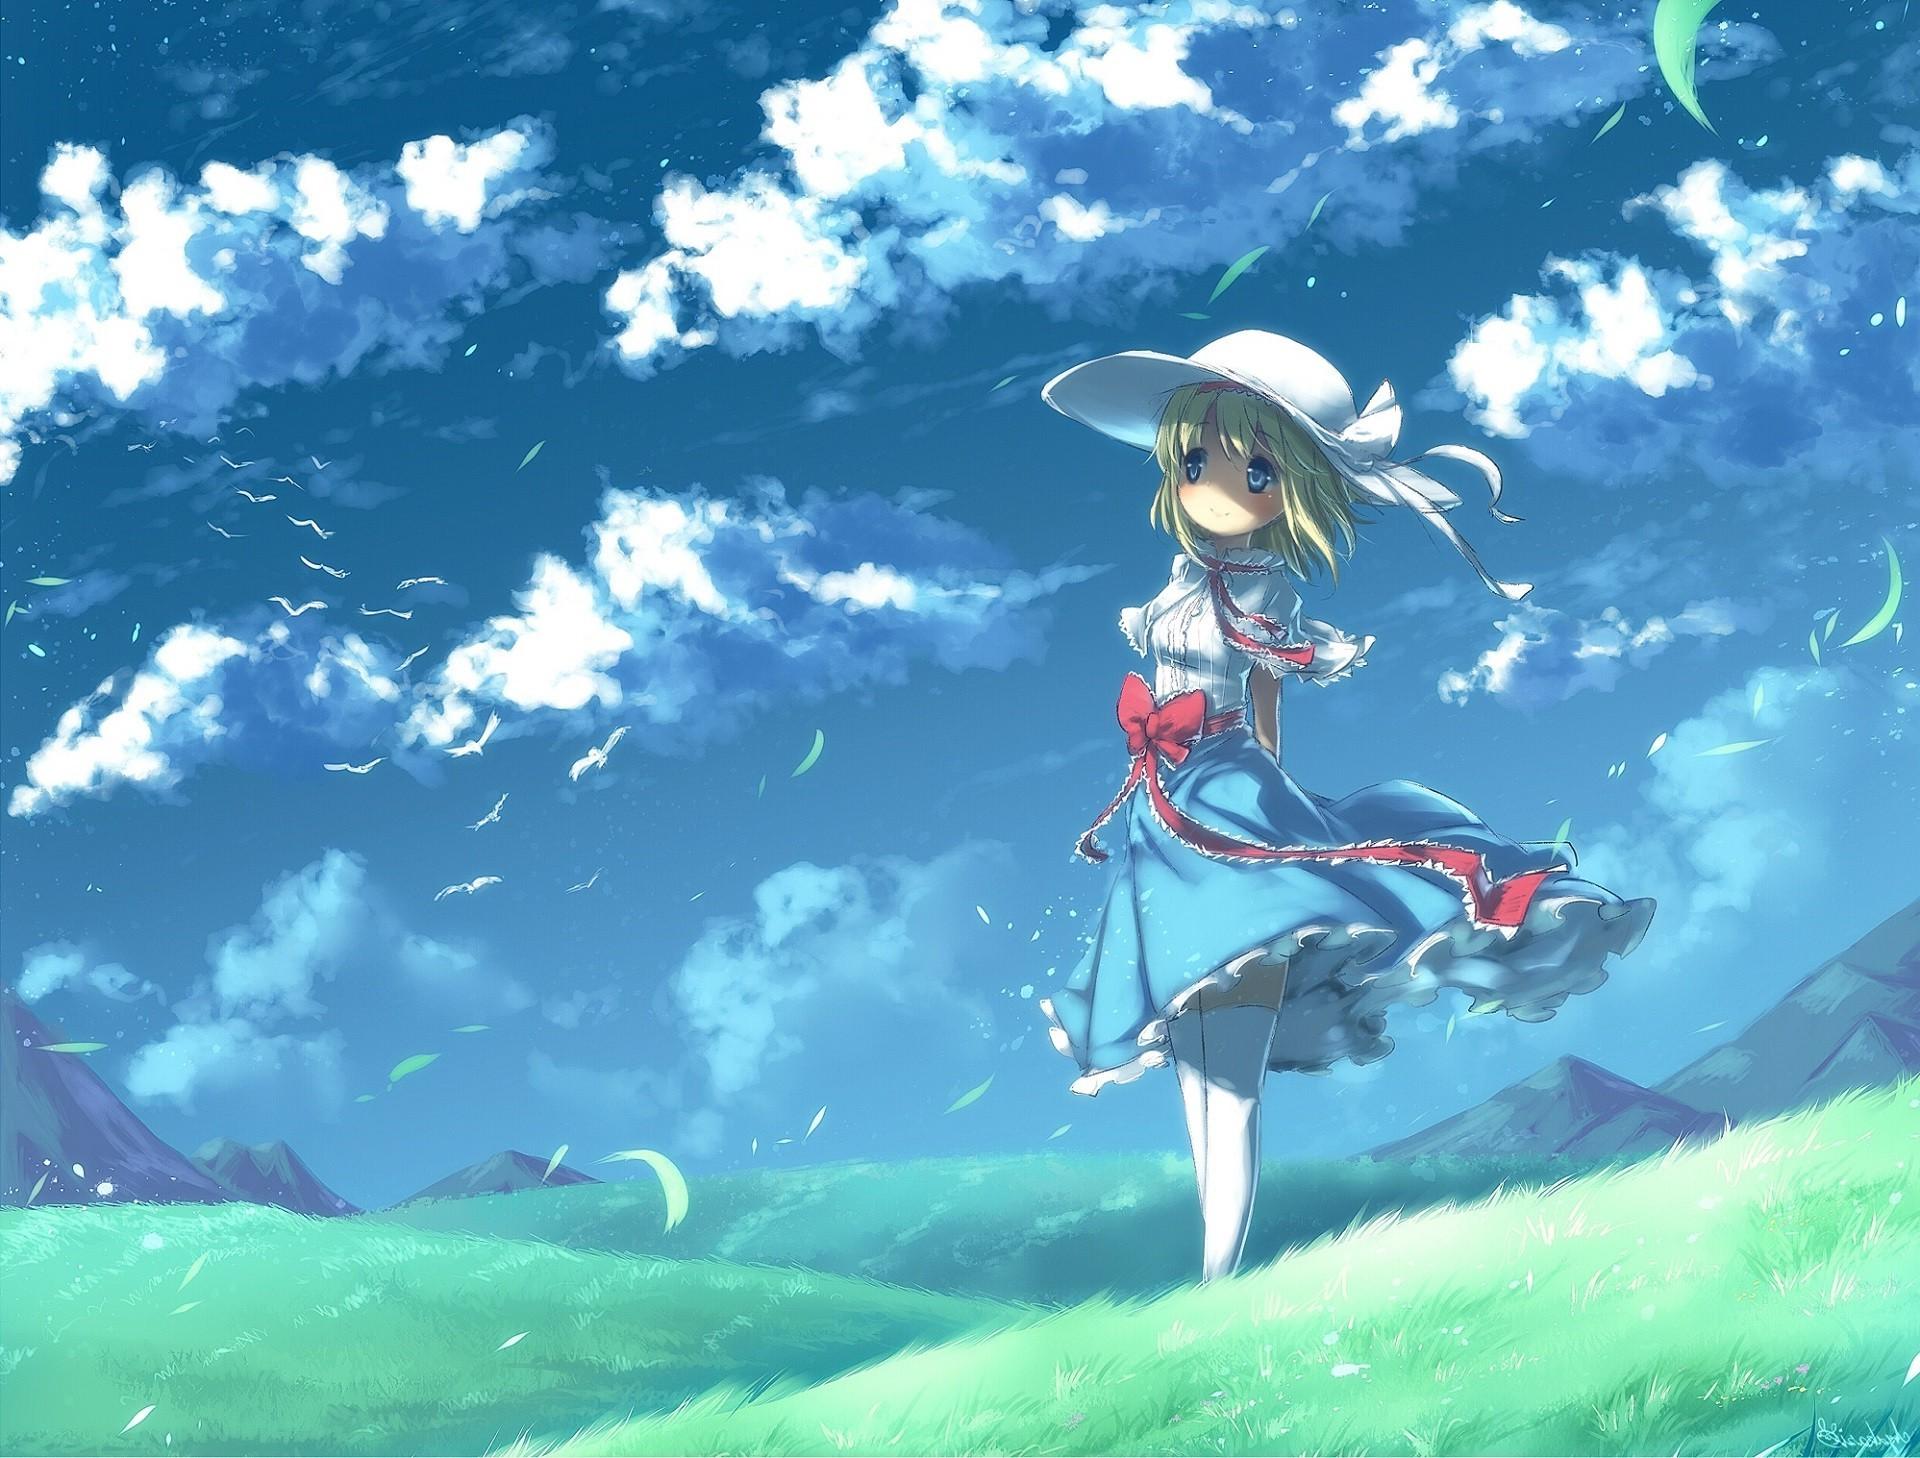 Nature Full Hd 3d Wallpapers 1920x1080 Anime Girls Field Dress Landscape Clouds Sky Birds